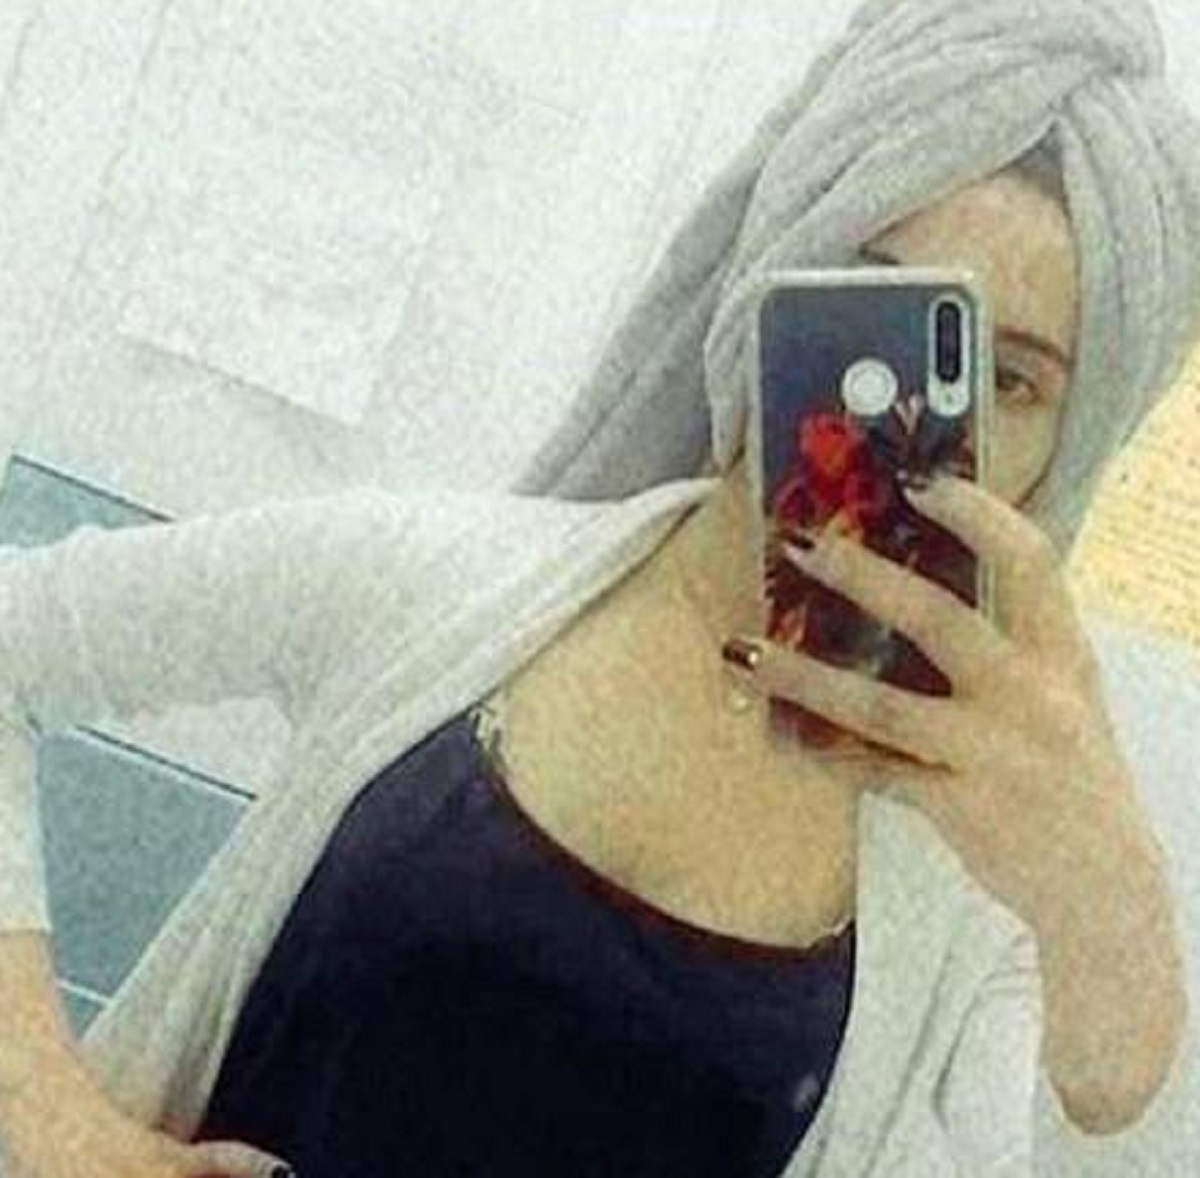 Reggio Emilia Saman Abbas scomparsa arresto cugino